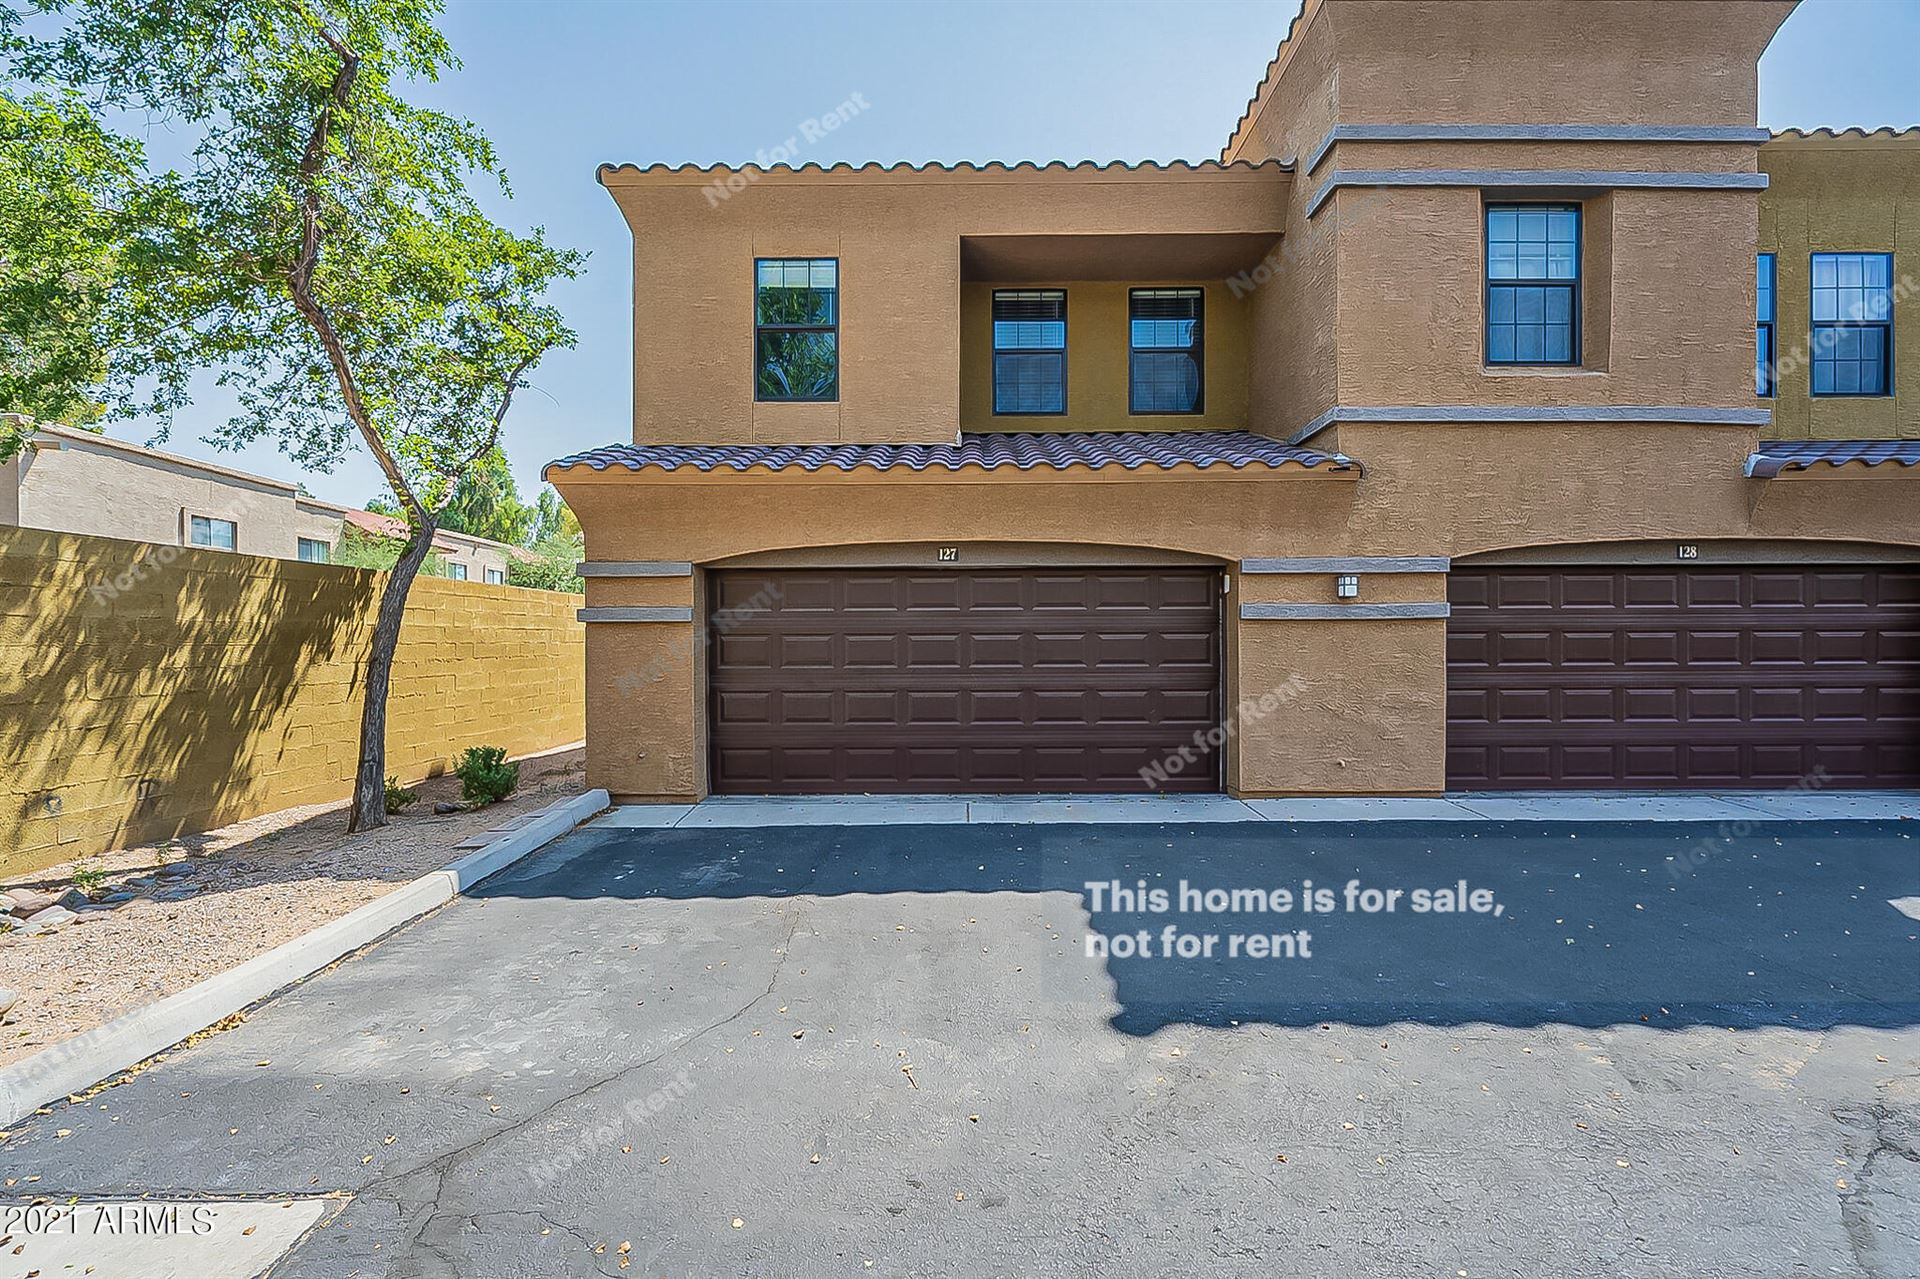 1702 E BELL Road, Phoenix, AZ 85022 - MLS#: 6293387